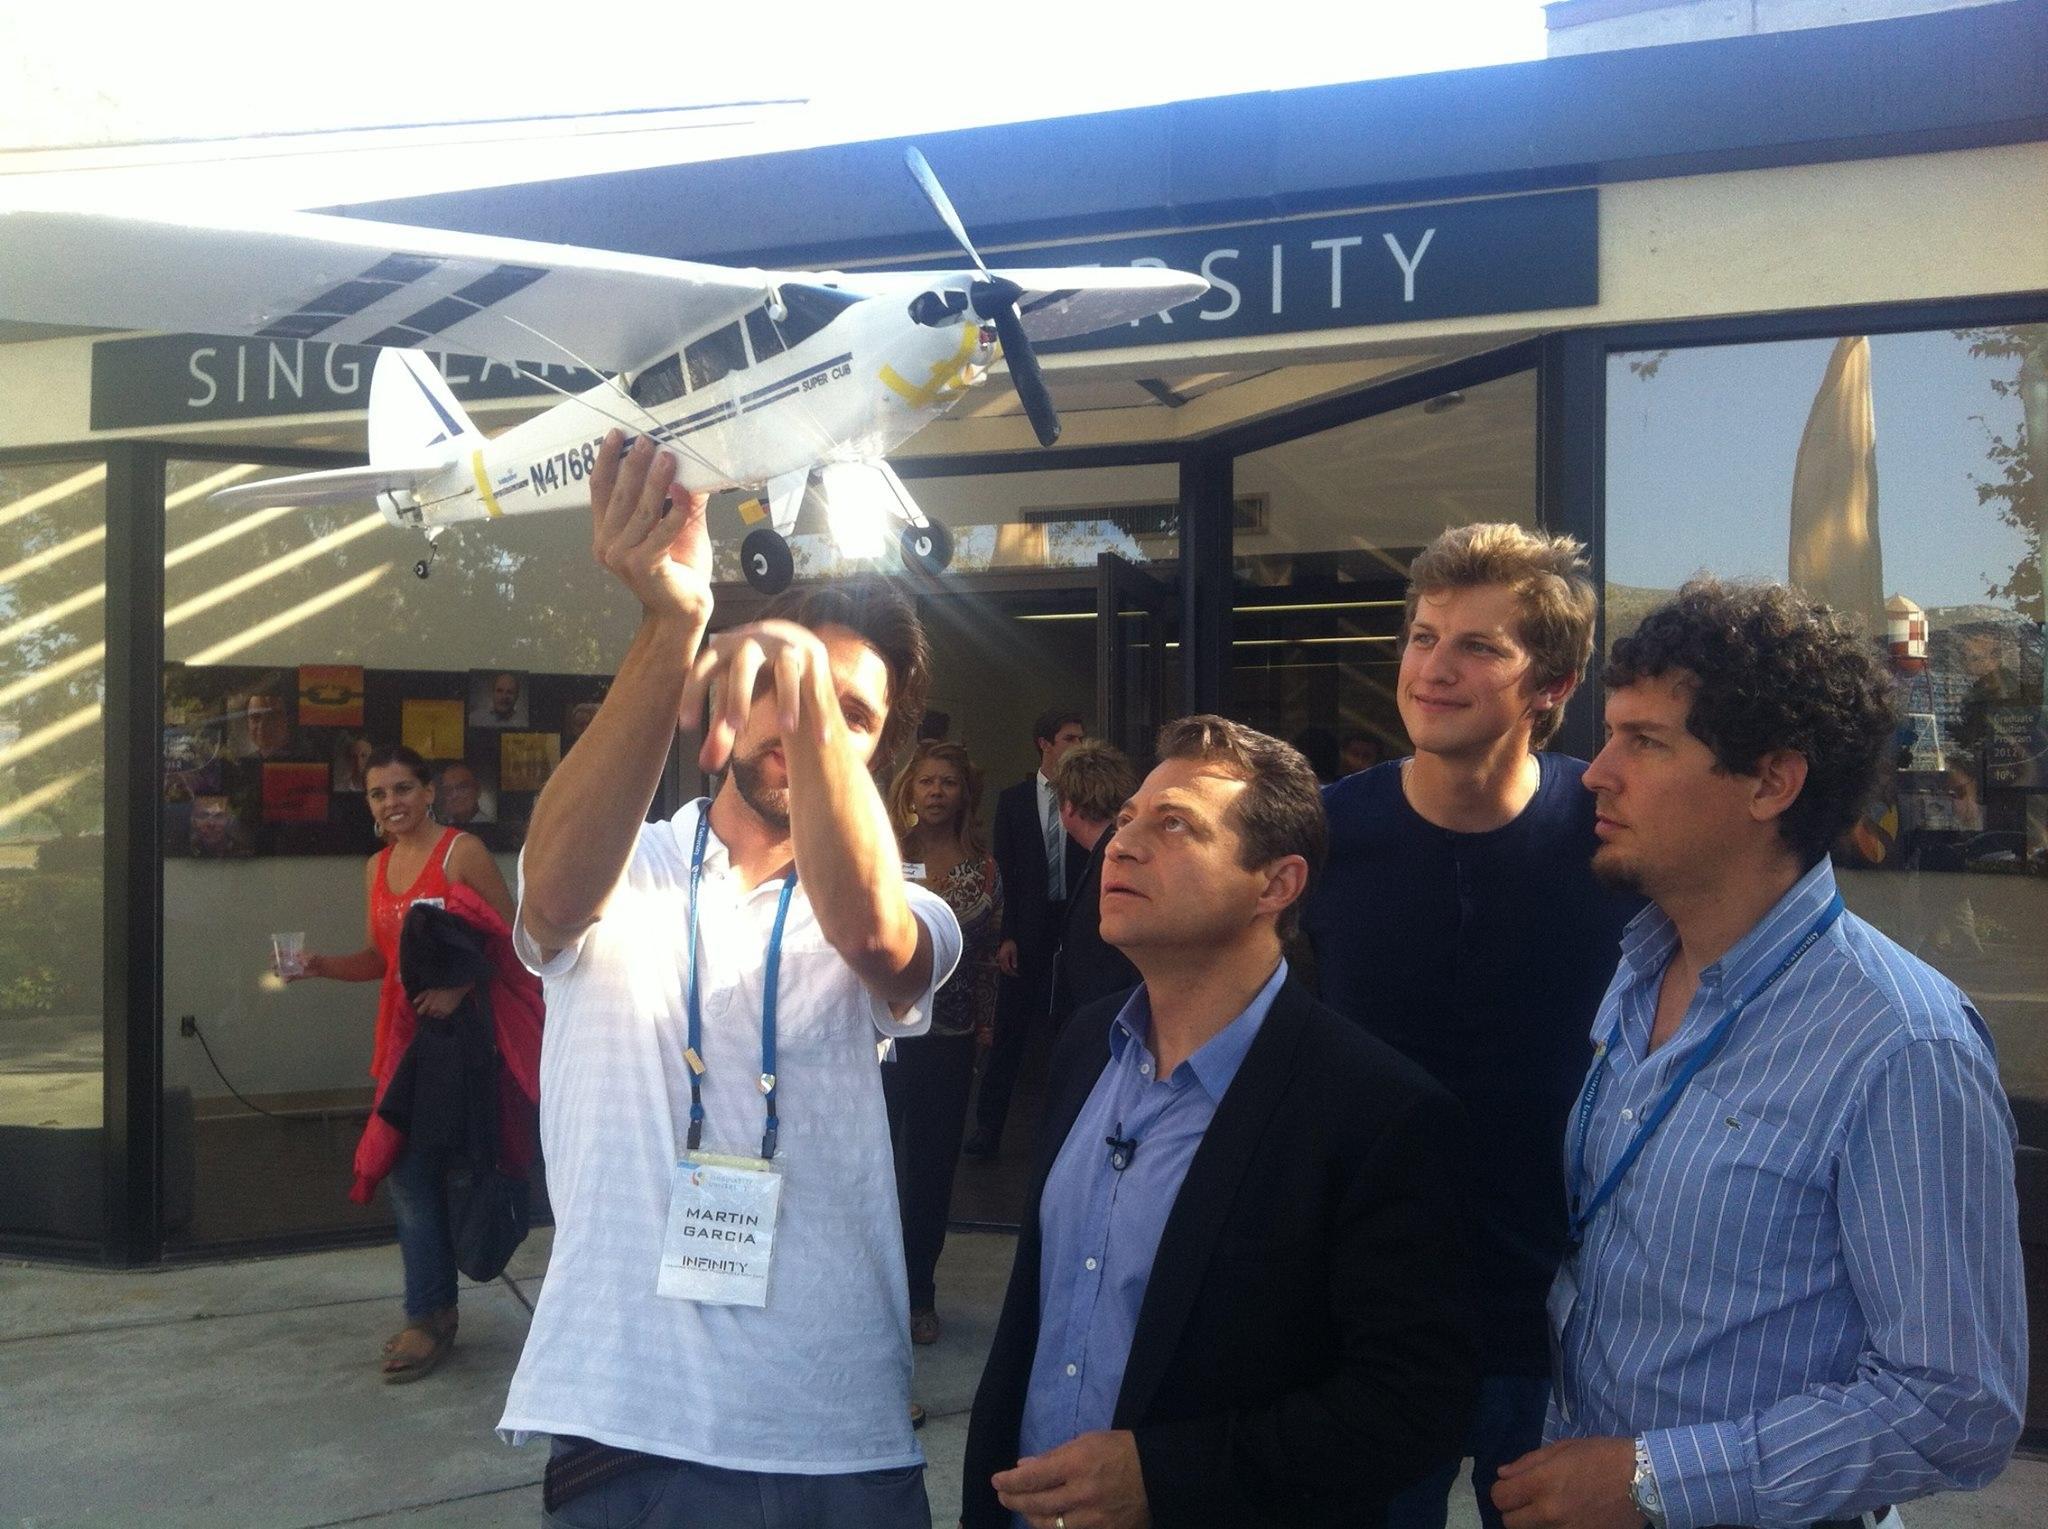 Menshenin and his team with Singularity University and XPRIZE founder Peter Diamandis (second from left). Photo: Yaroslav Menshenin // Skoltech.